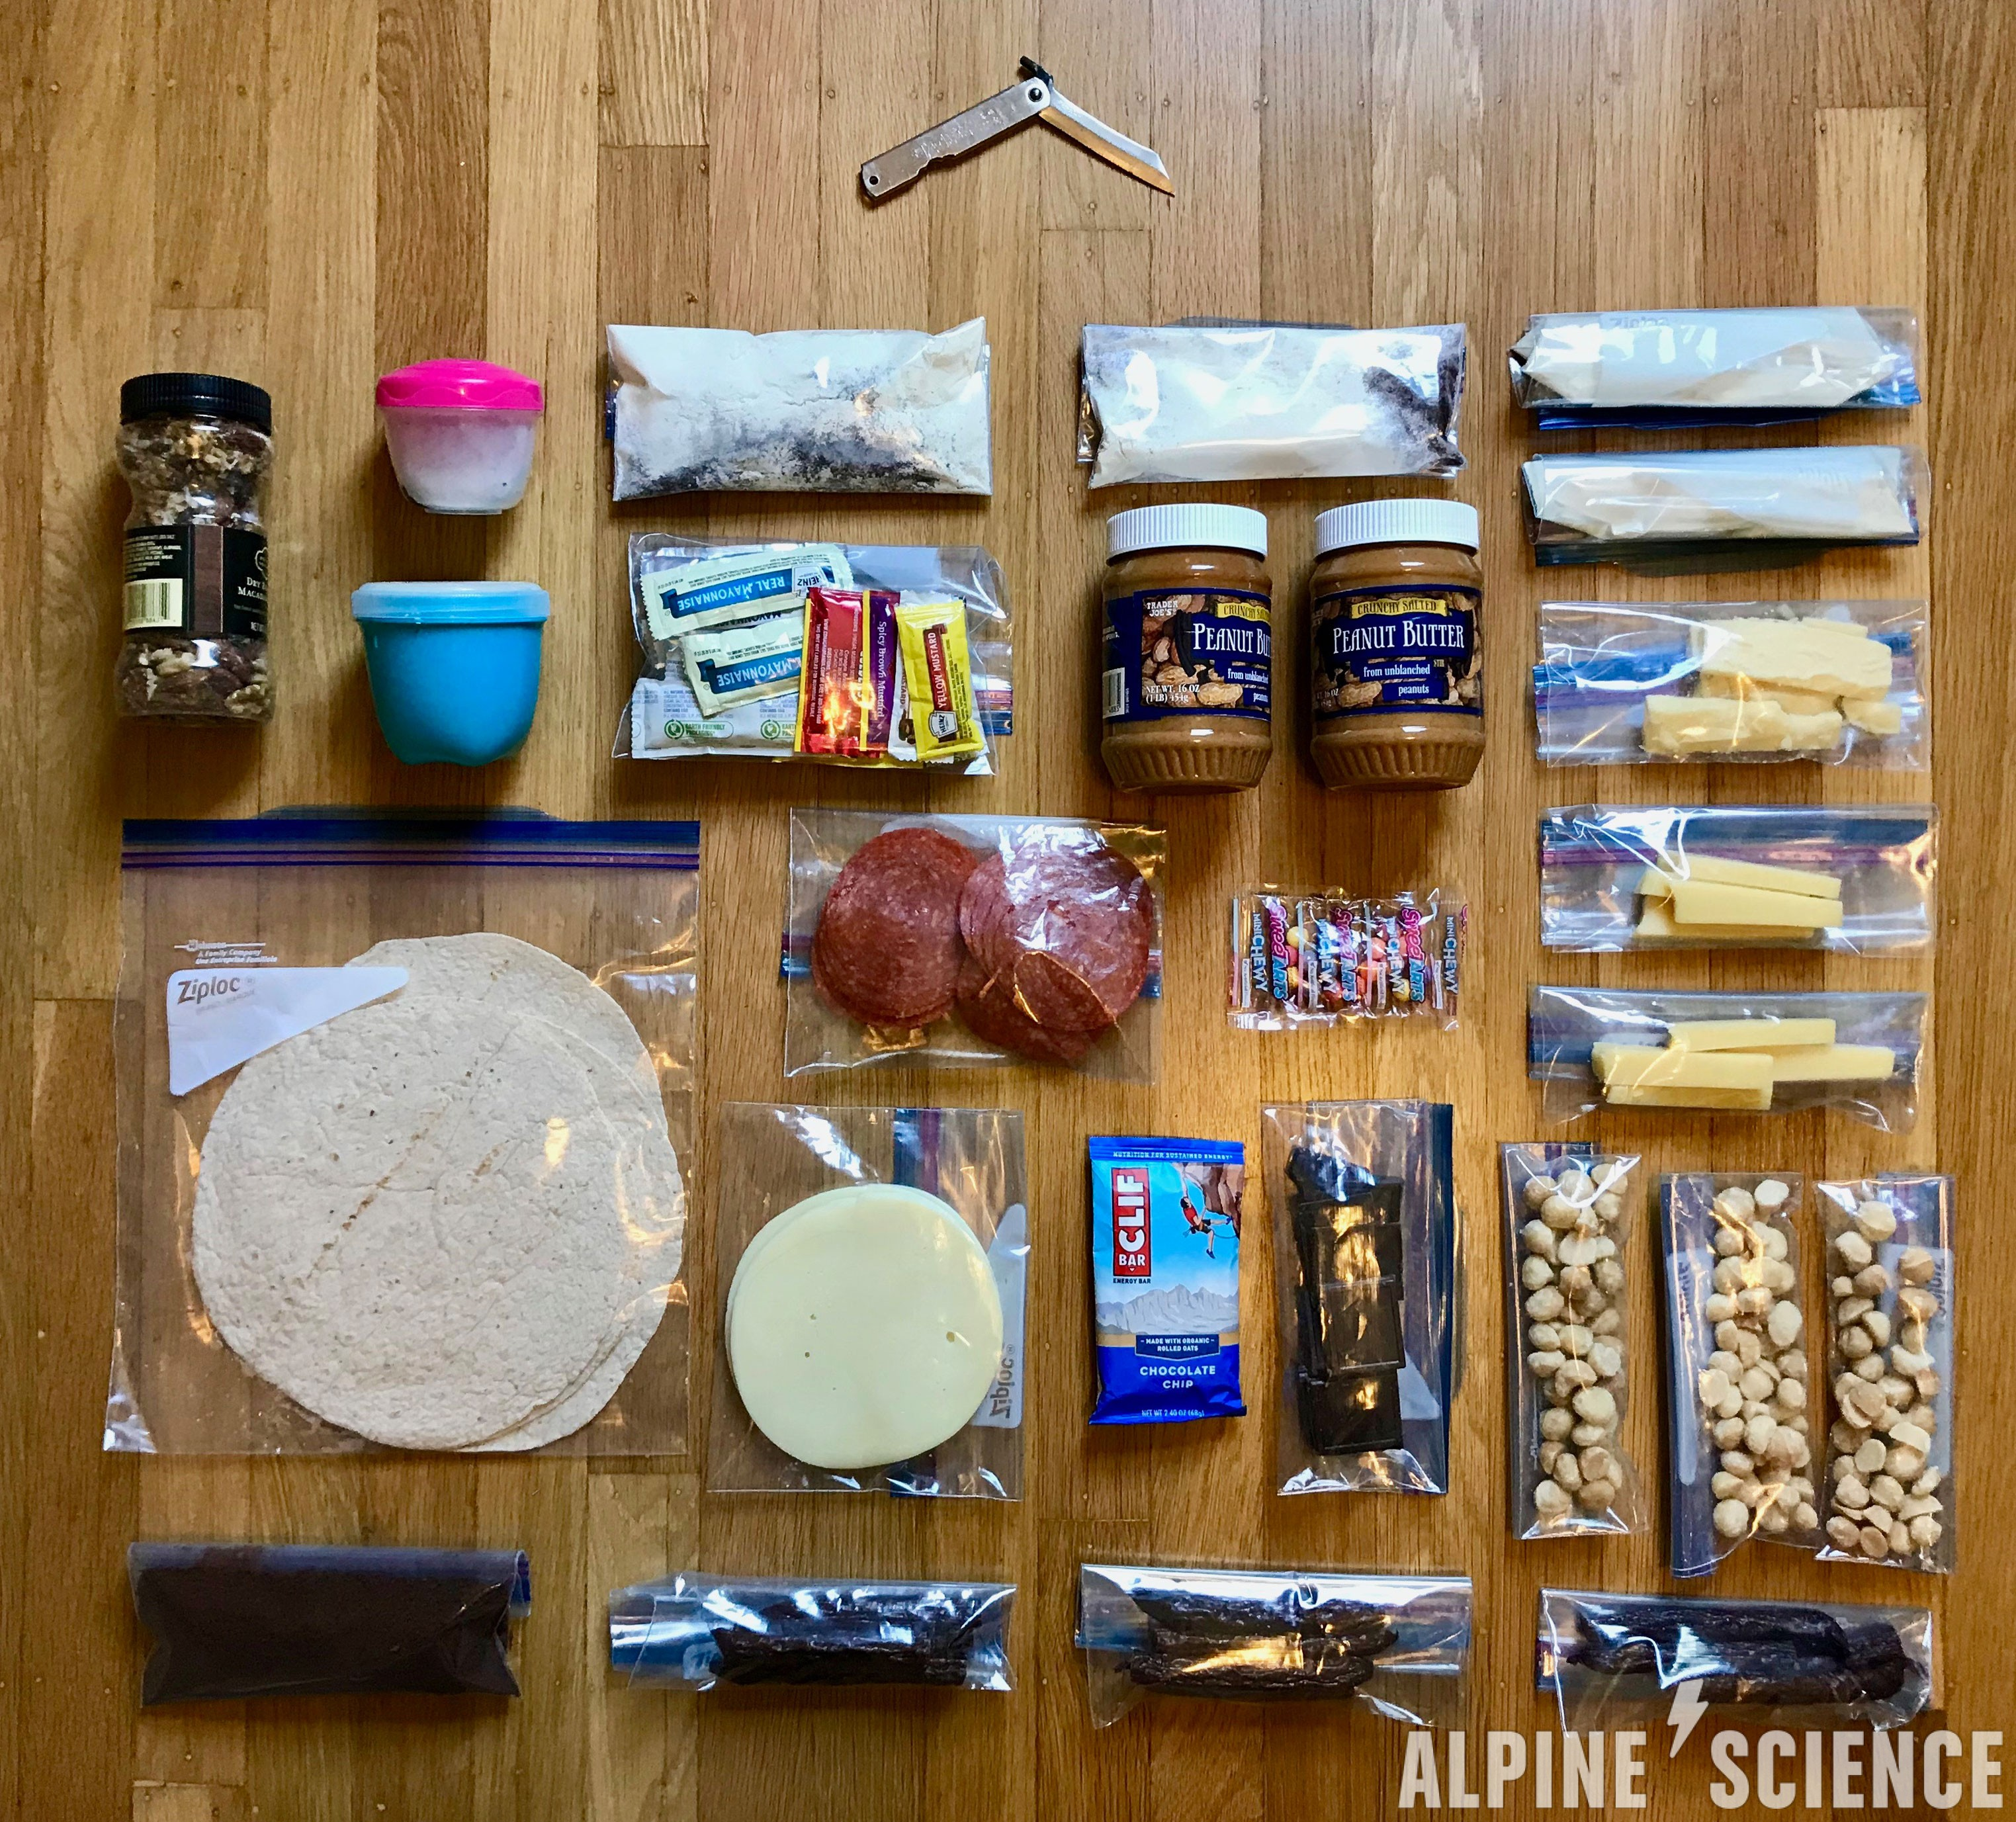 Keto Backpacking Food Basics for